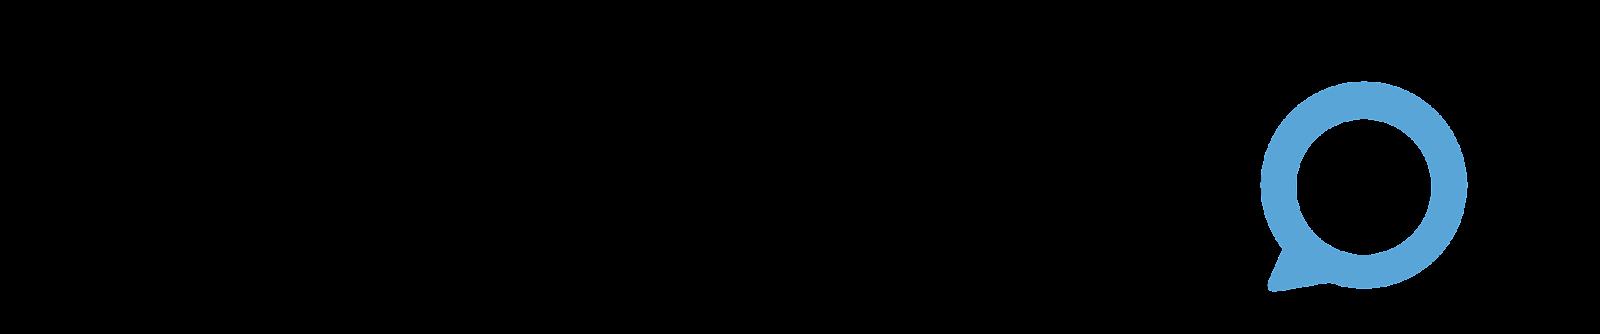 Speakspot logo